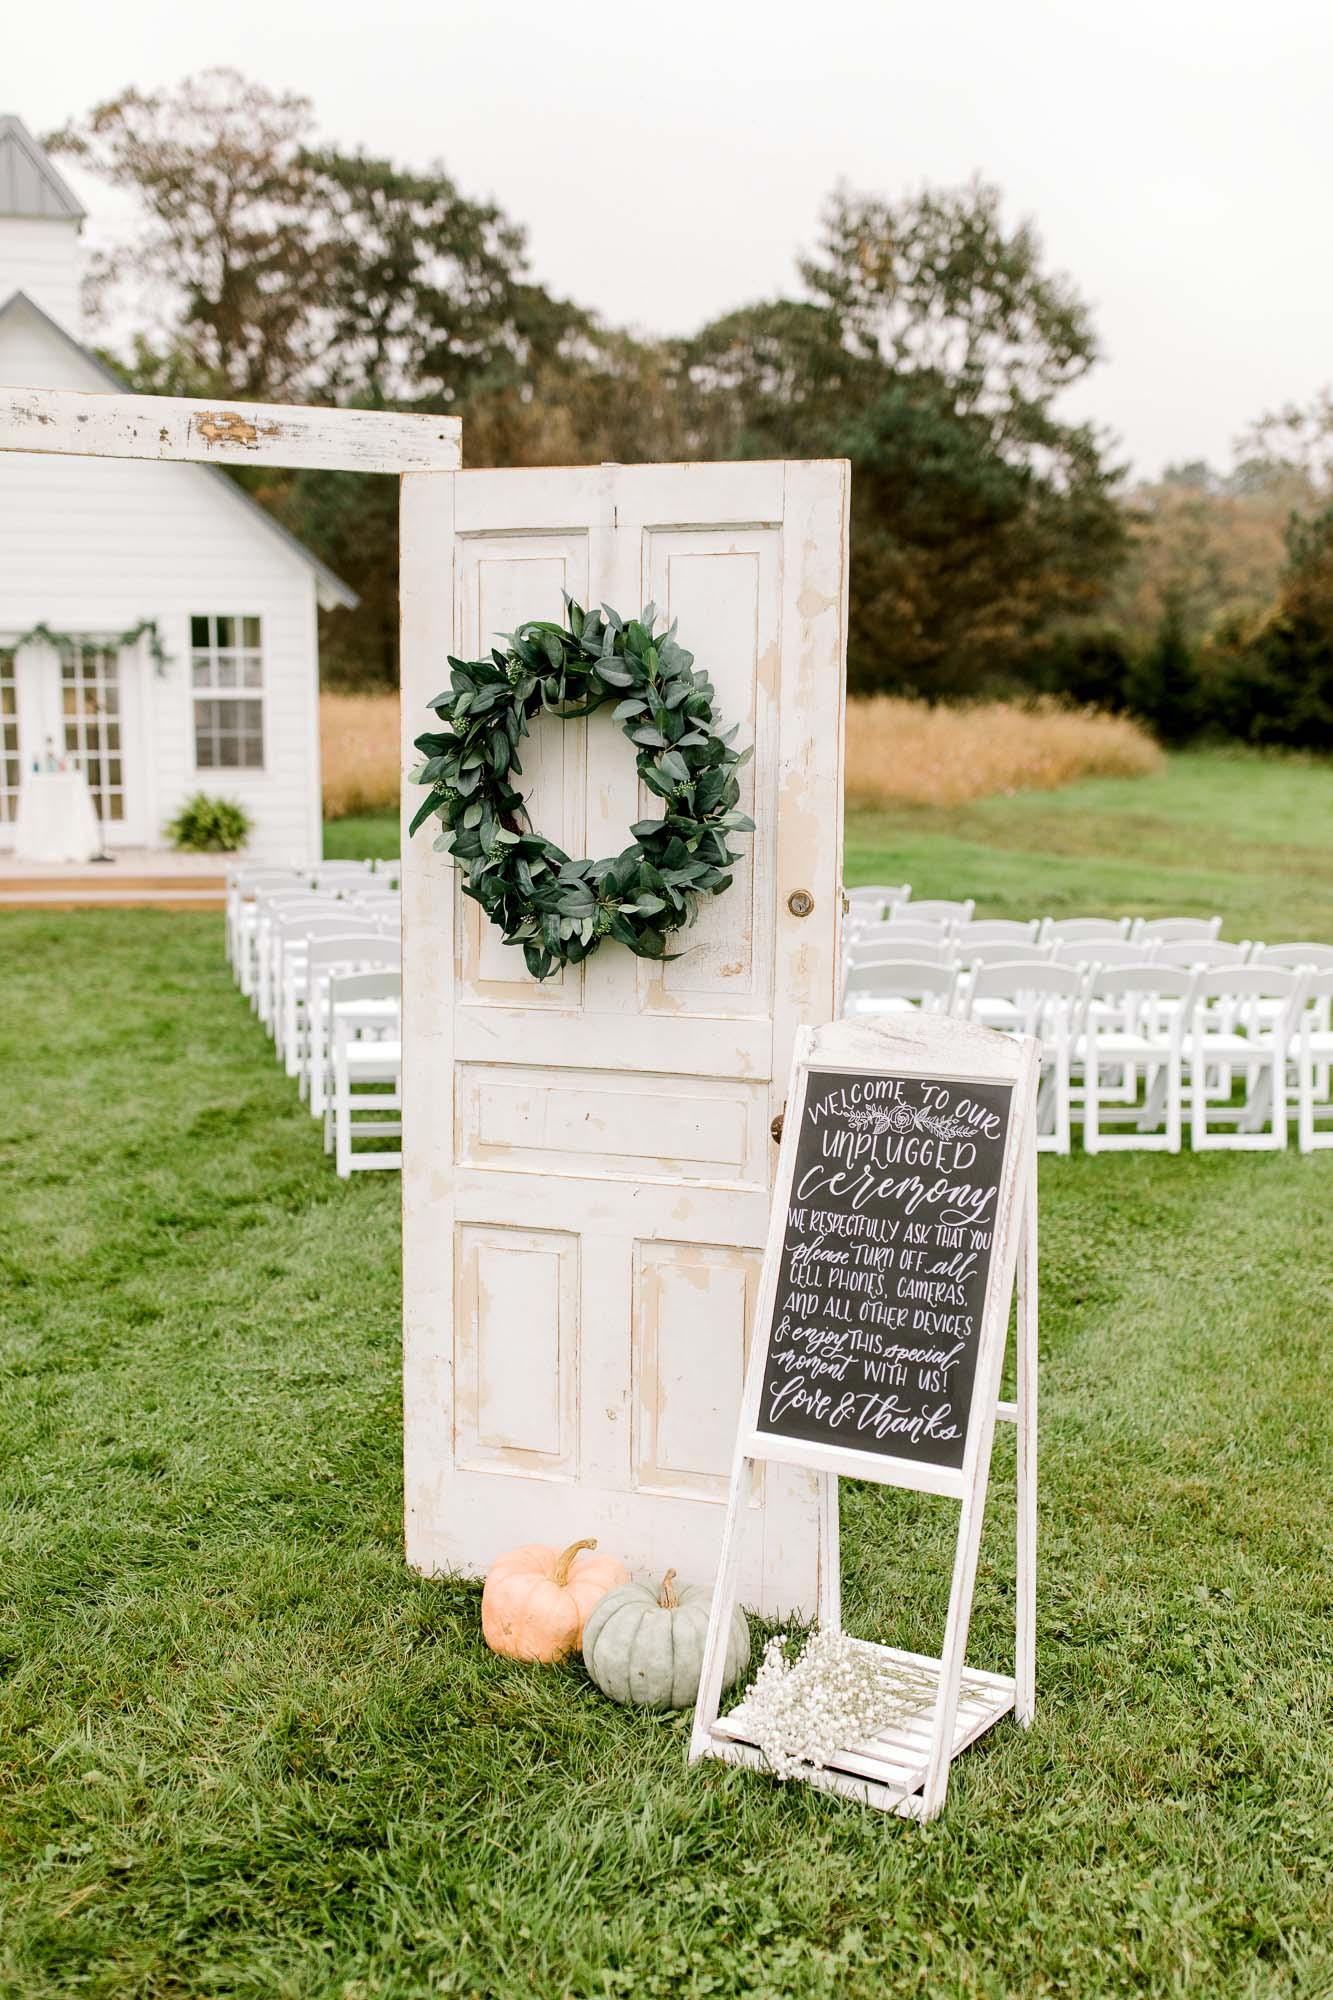 Lodge-at-Raven-Creek-October-wedding-12.jpg